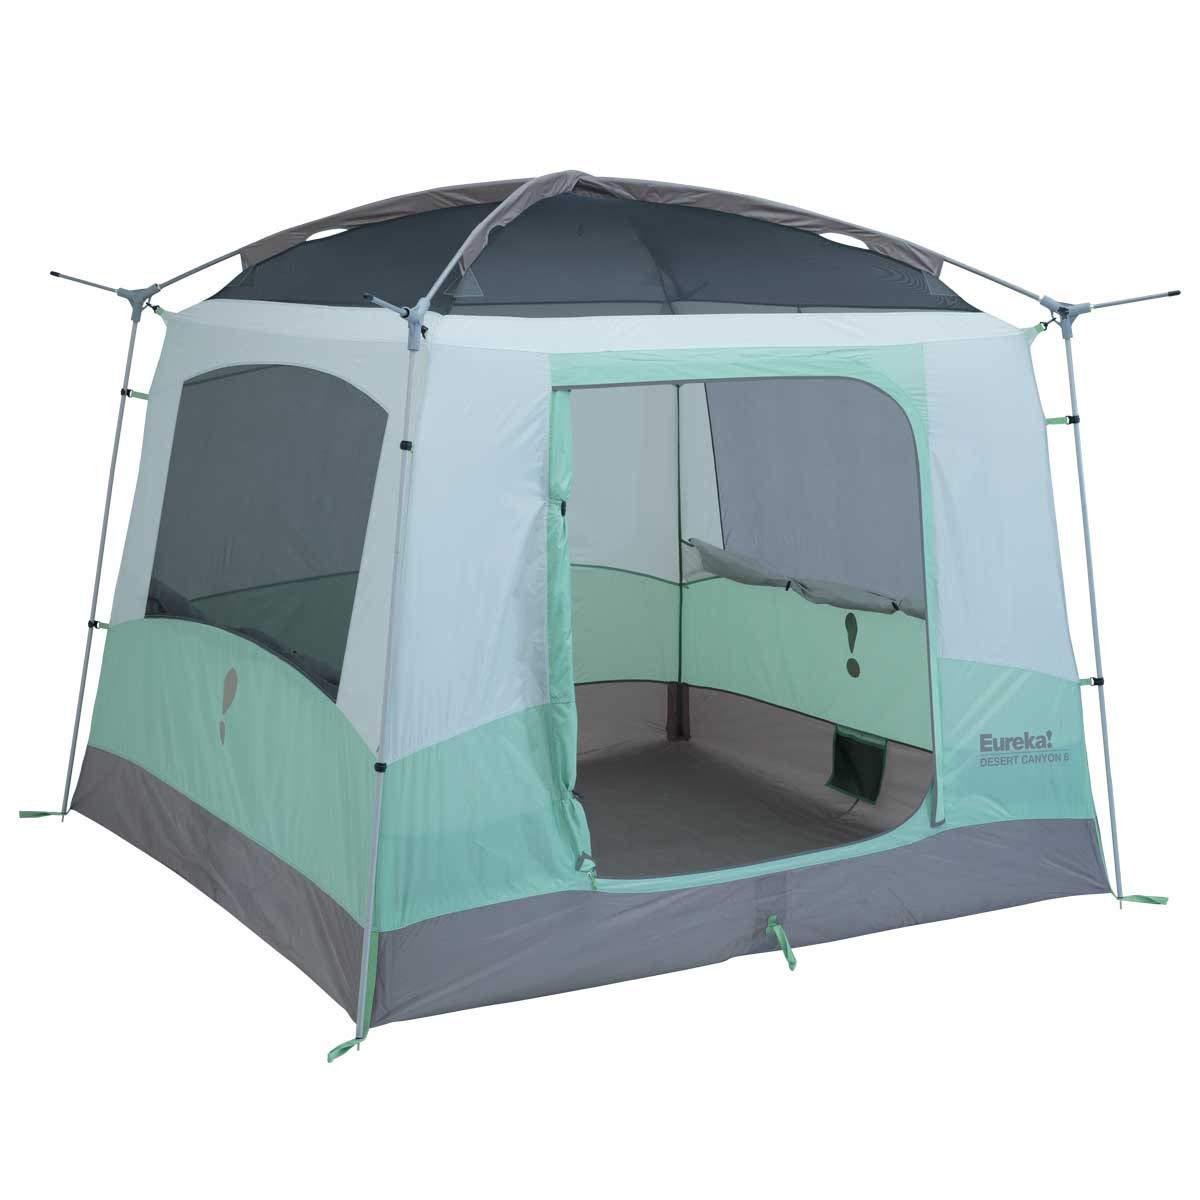 Eureka! Desert Canyon Three-Season Camping Tent